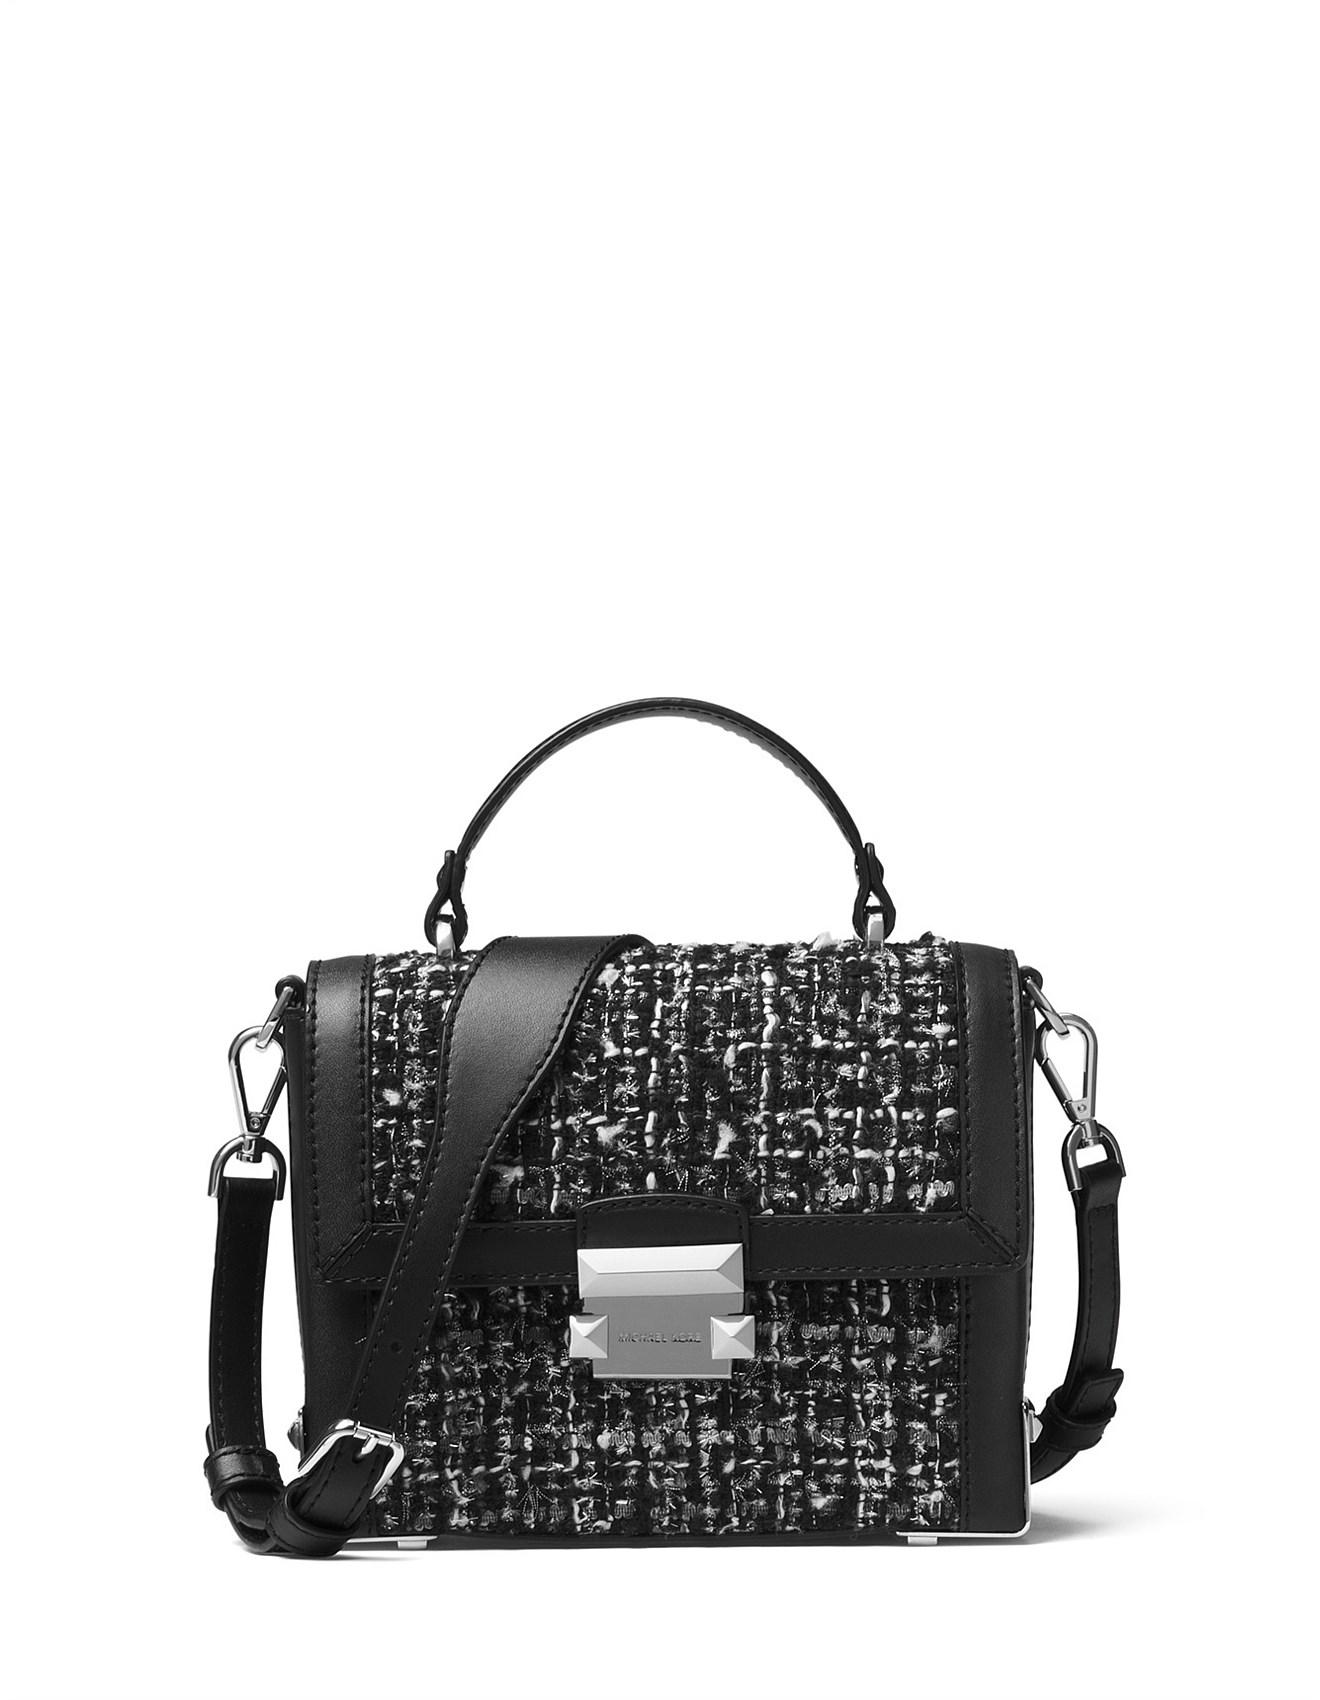 e52f93c8aa2a7 Jayne Small Pebbled Leather Trunk Bag. 1  2  3  4. Zoom. Michael Kors